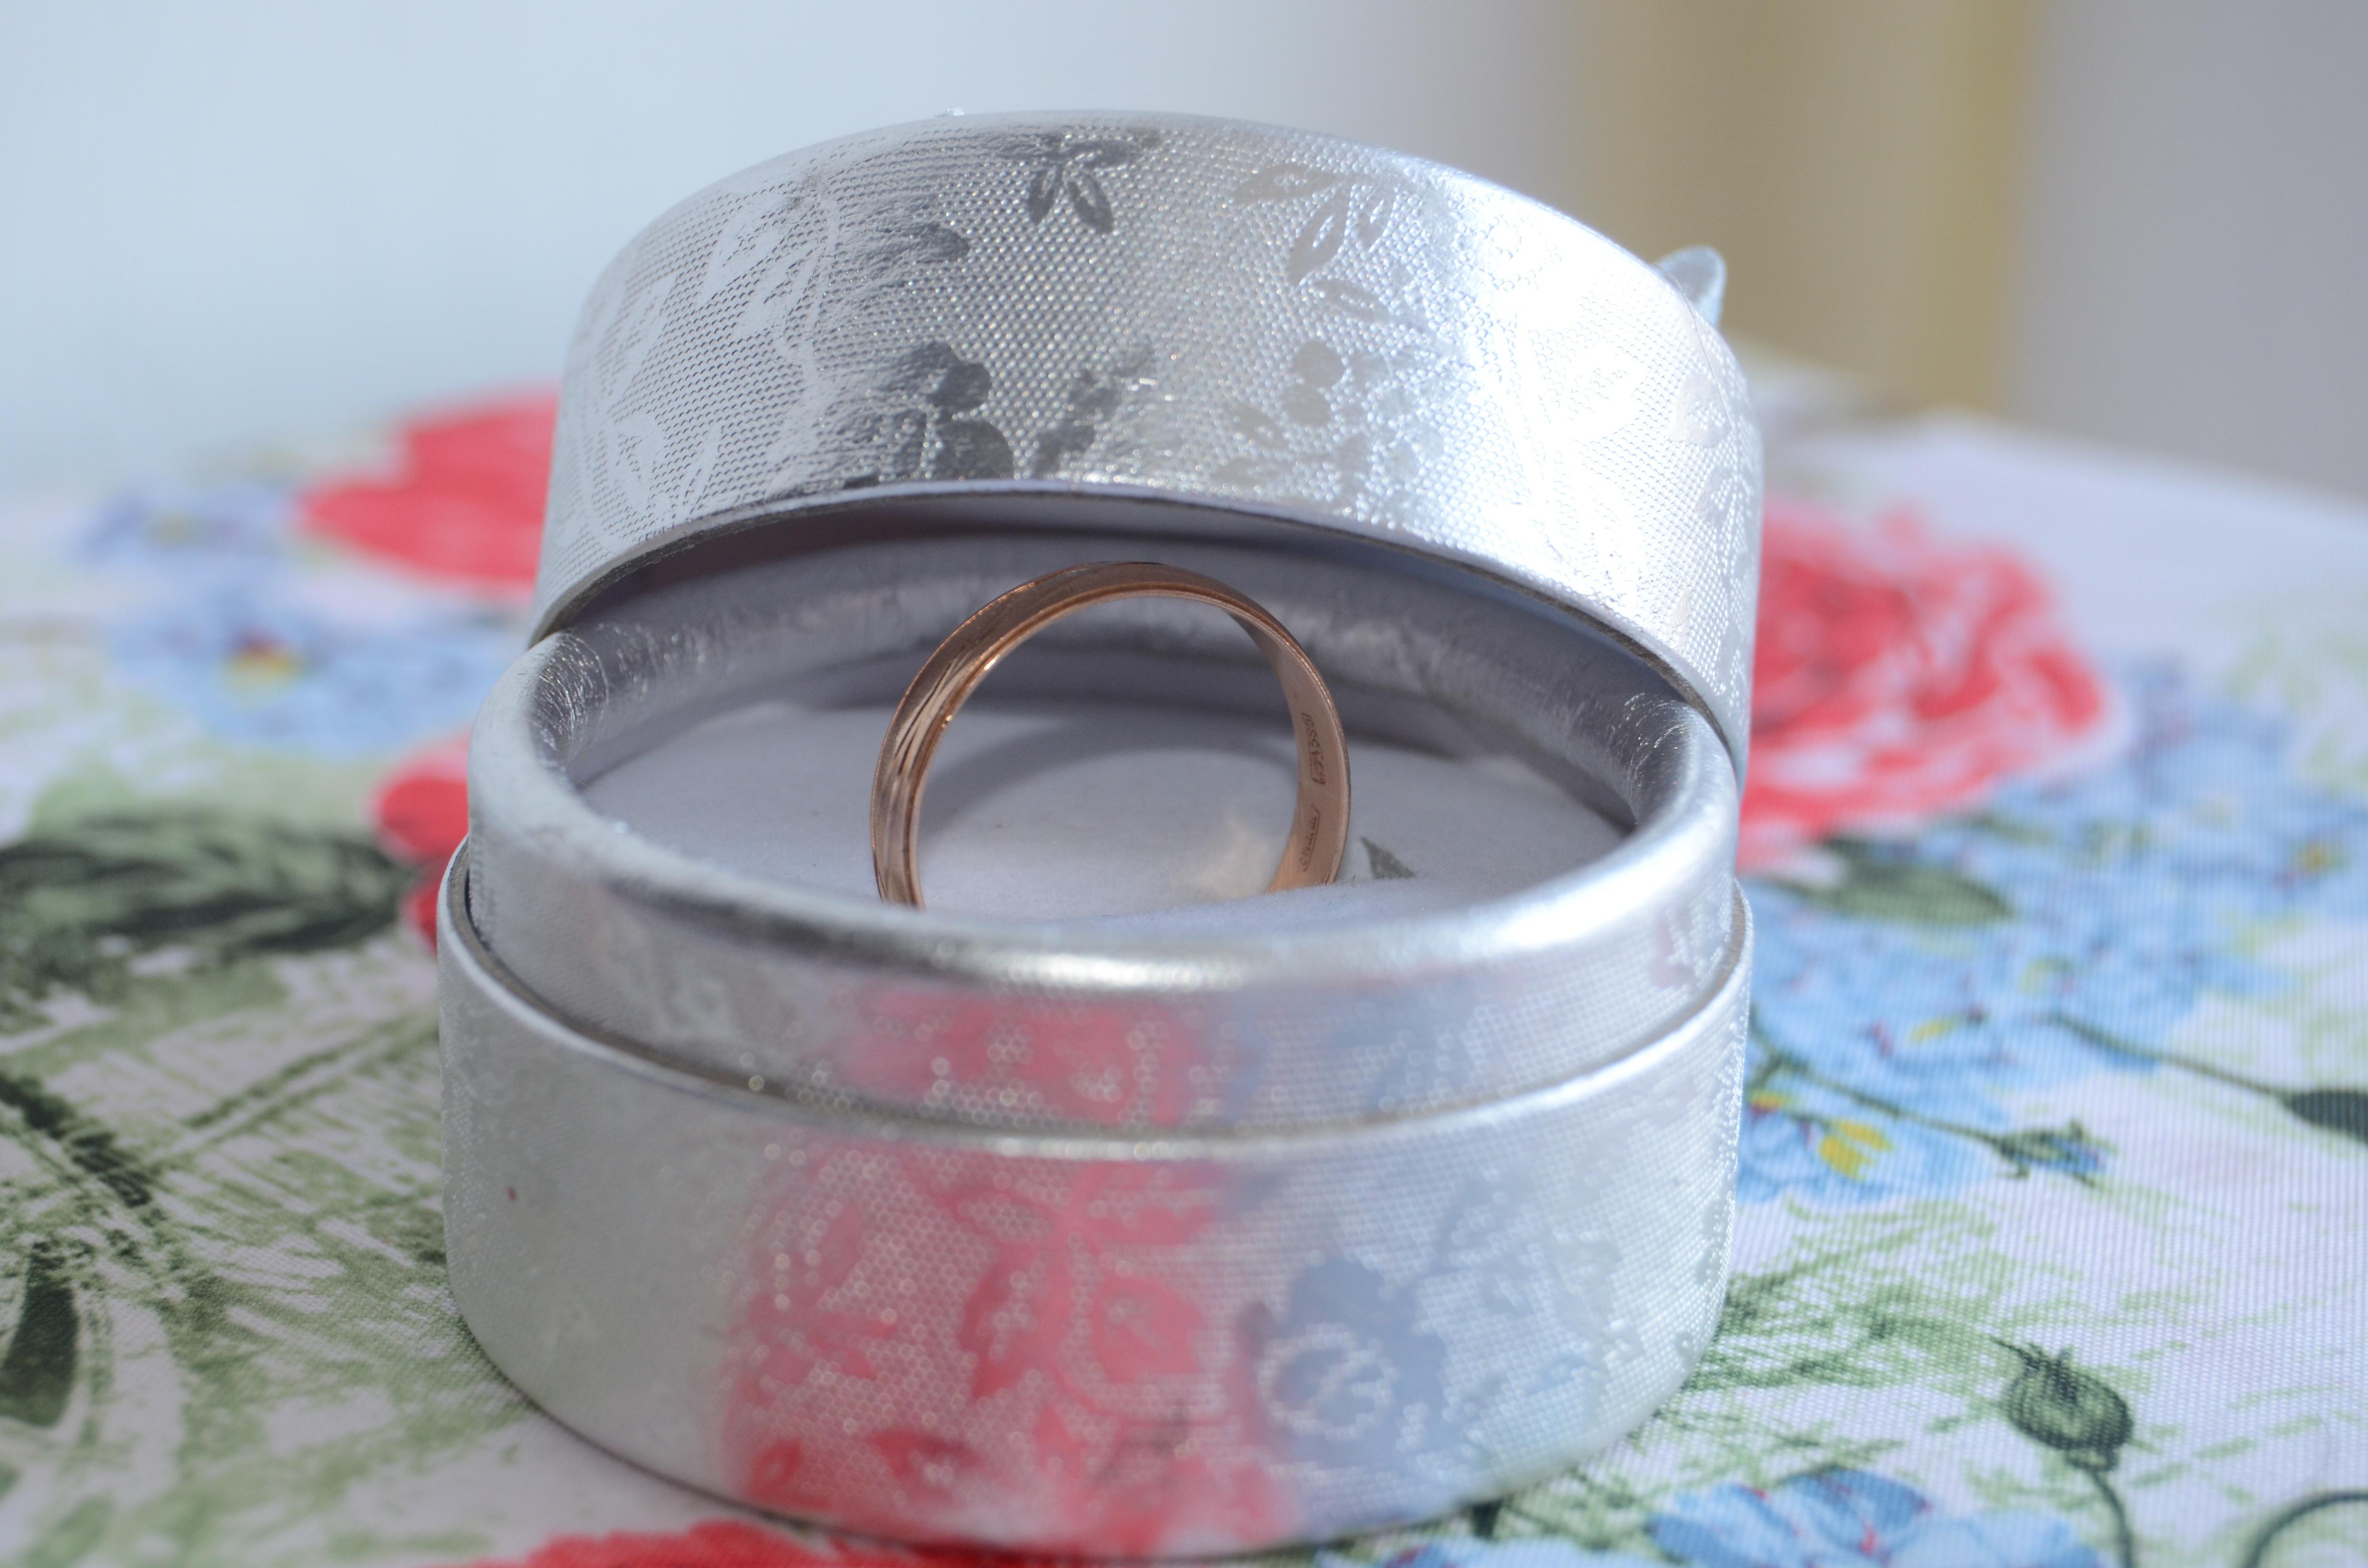 Сниться кольцо в подарок